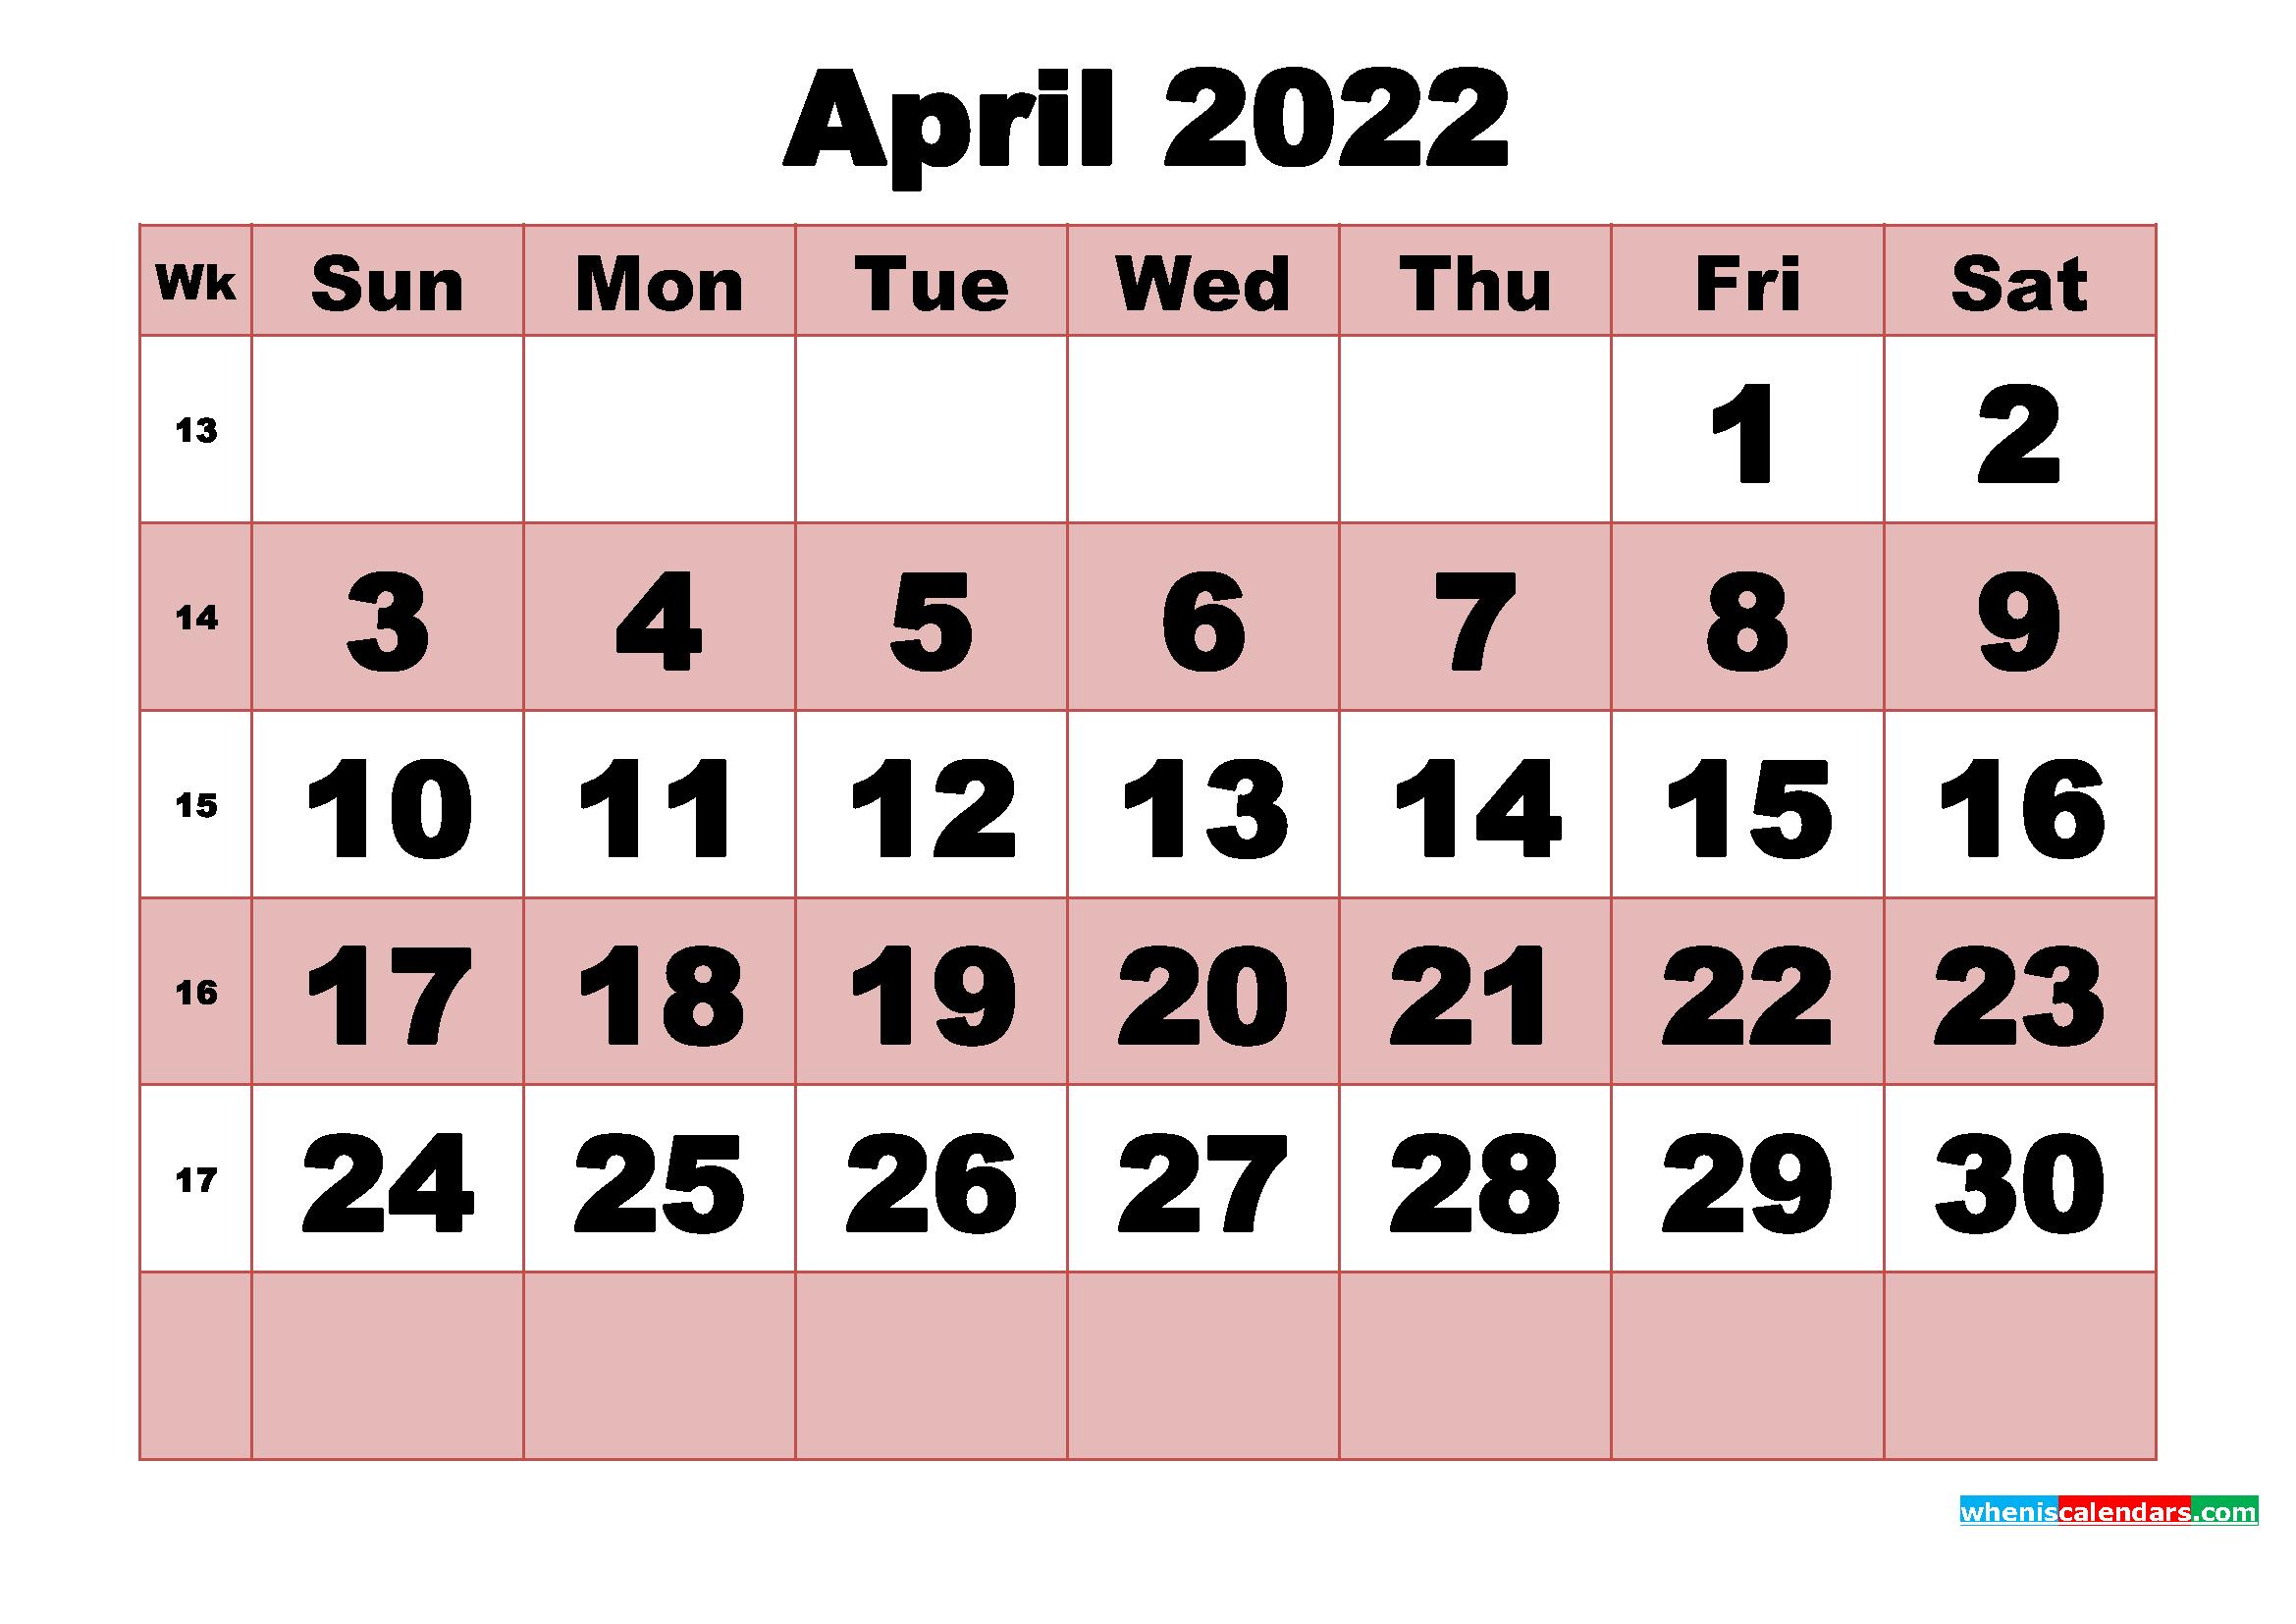 Free Printable Monthly Calendar April 2022 with regard to April 2022 Calendar Printable Images Photo